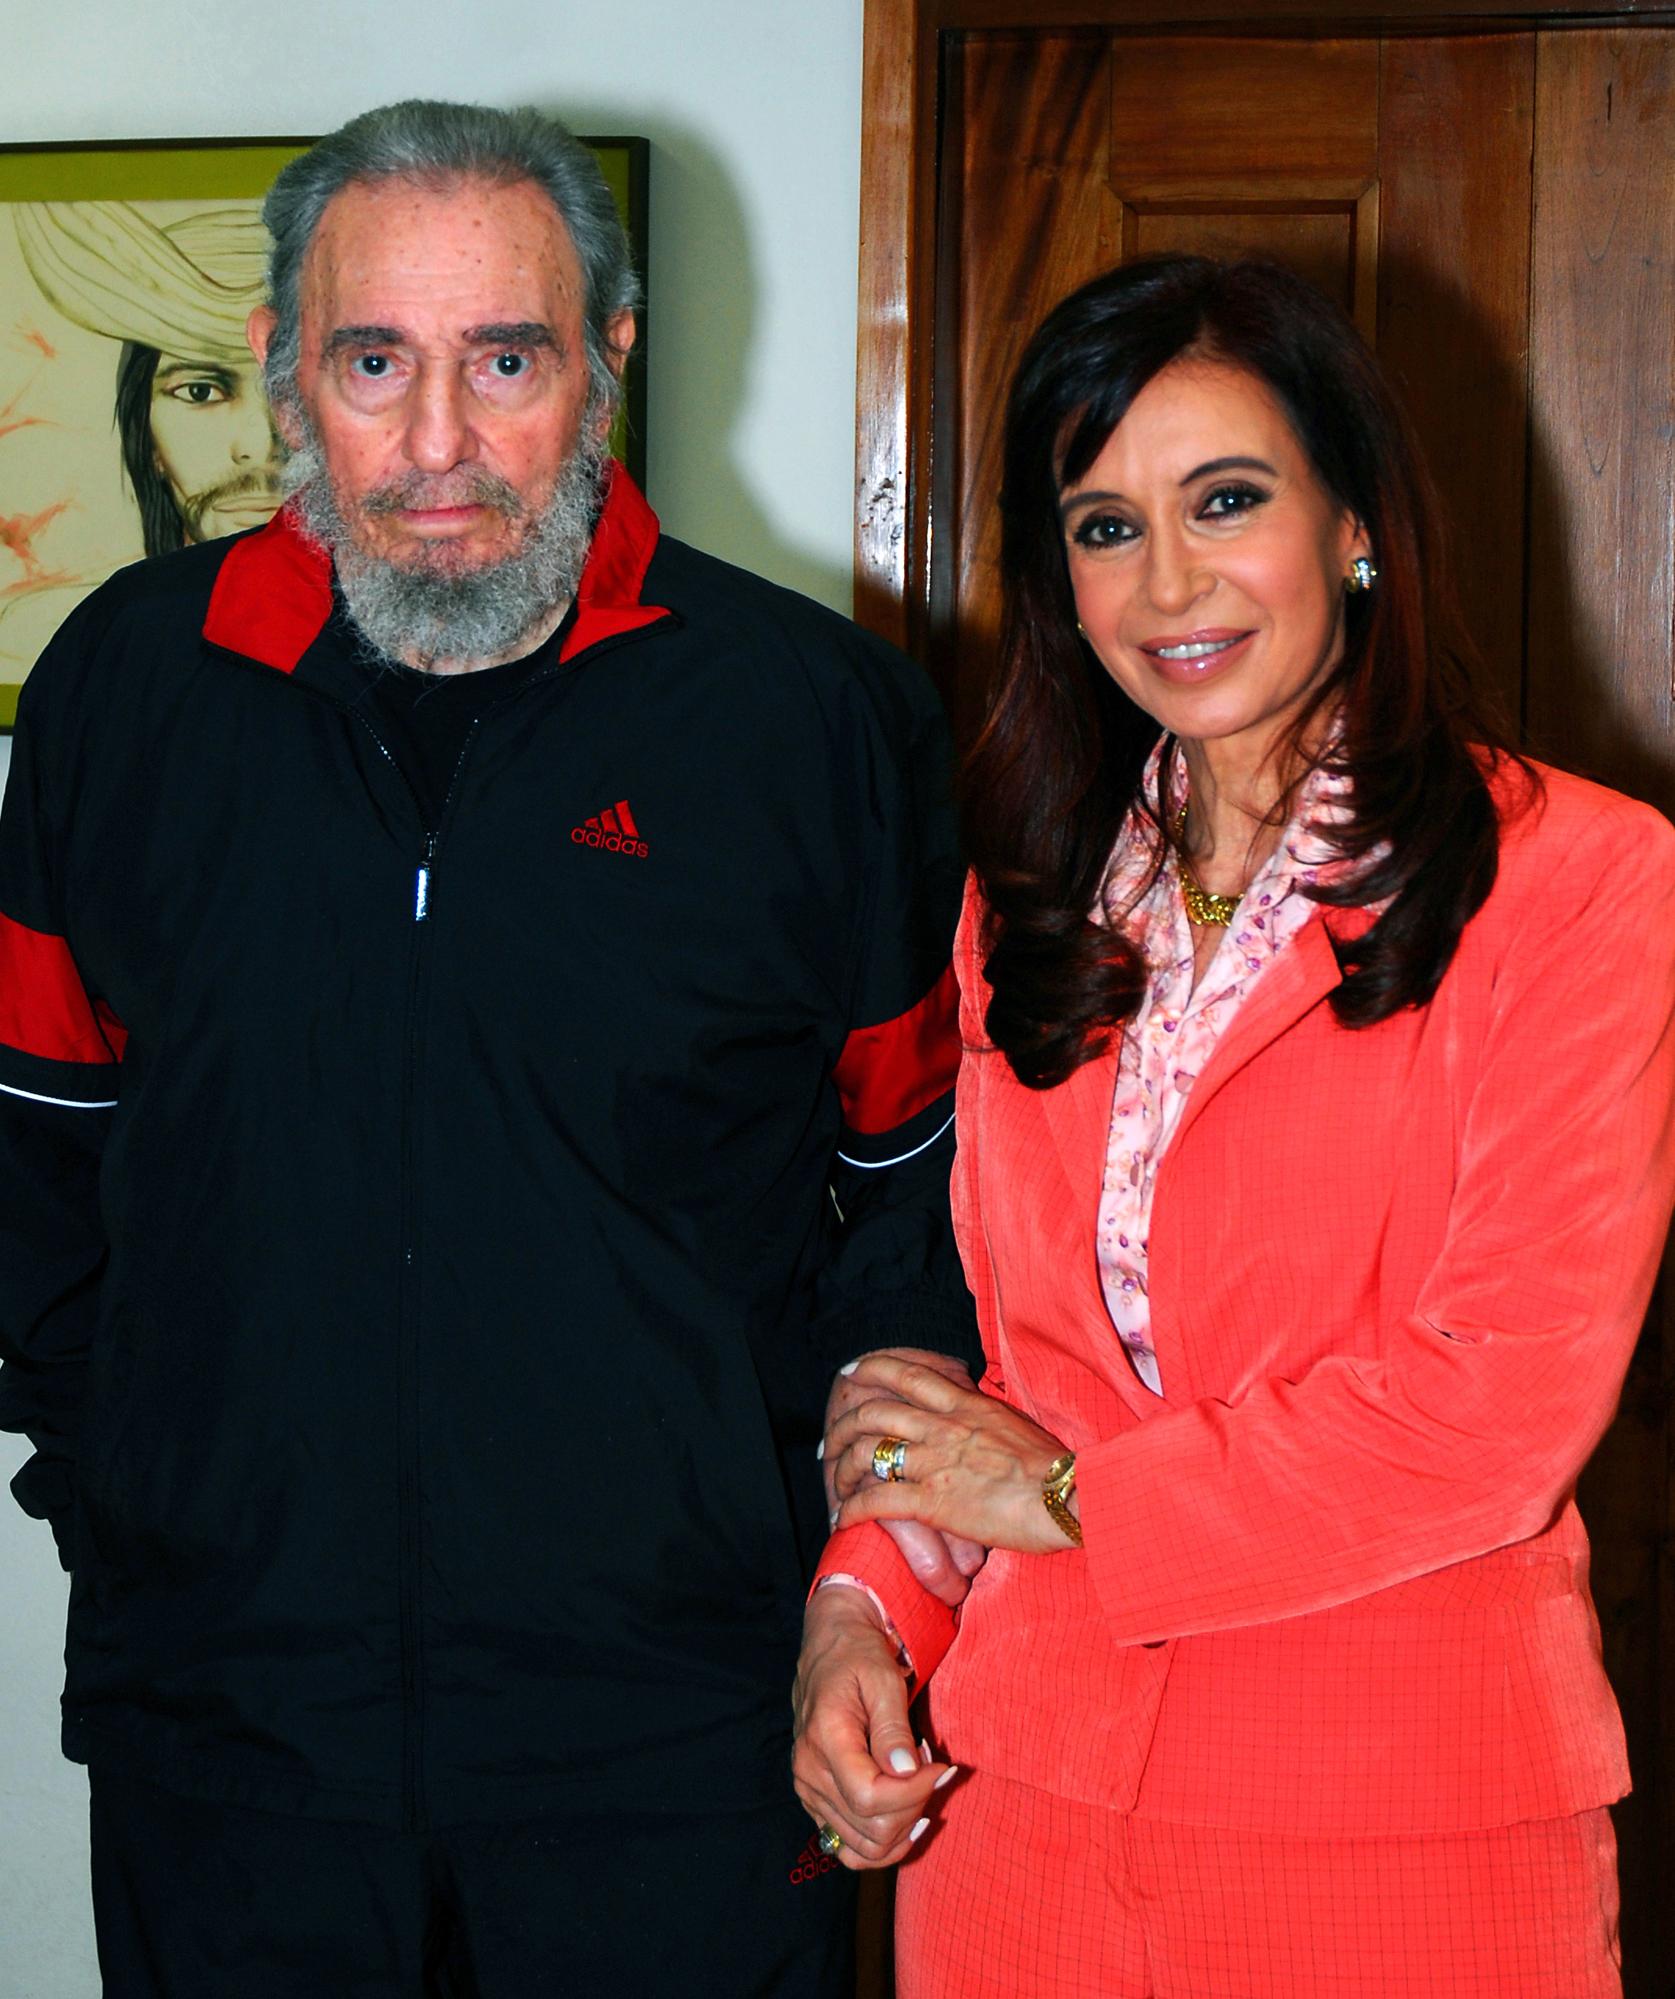 Castro junto a la presidenta de Argentina, Cristina Fernández de Kirchner, enero de 2009.